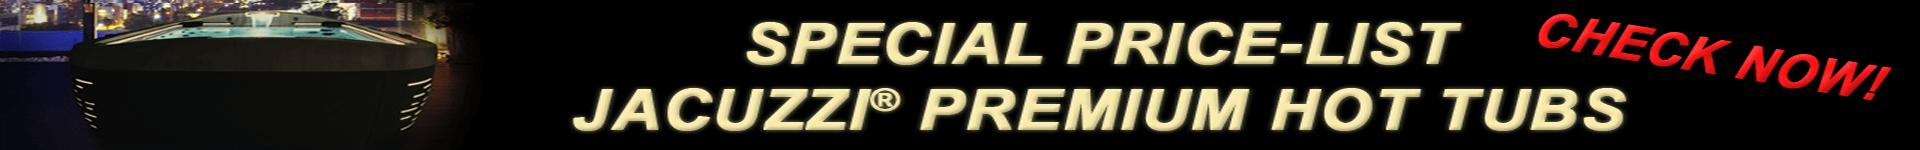 jacuzzi_special_pricelist_1920px